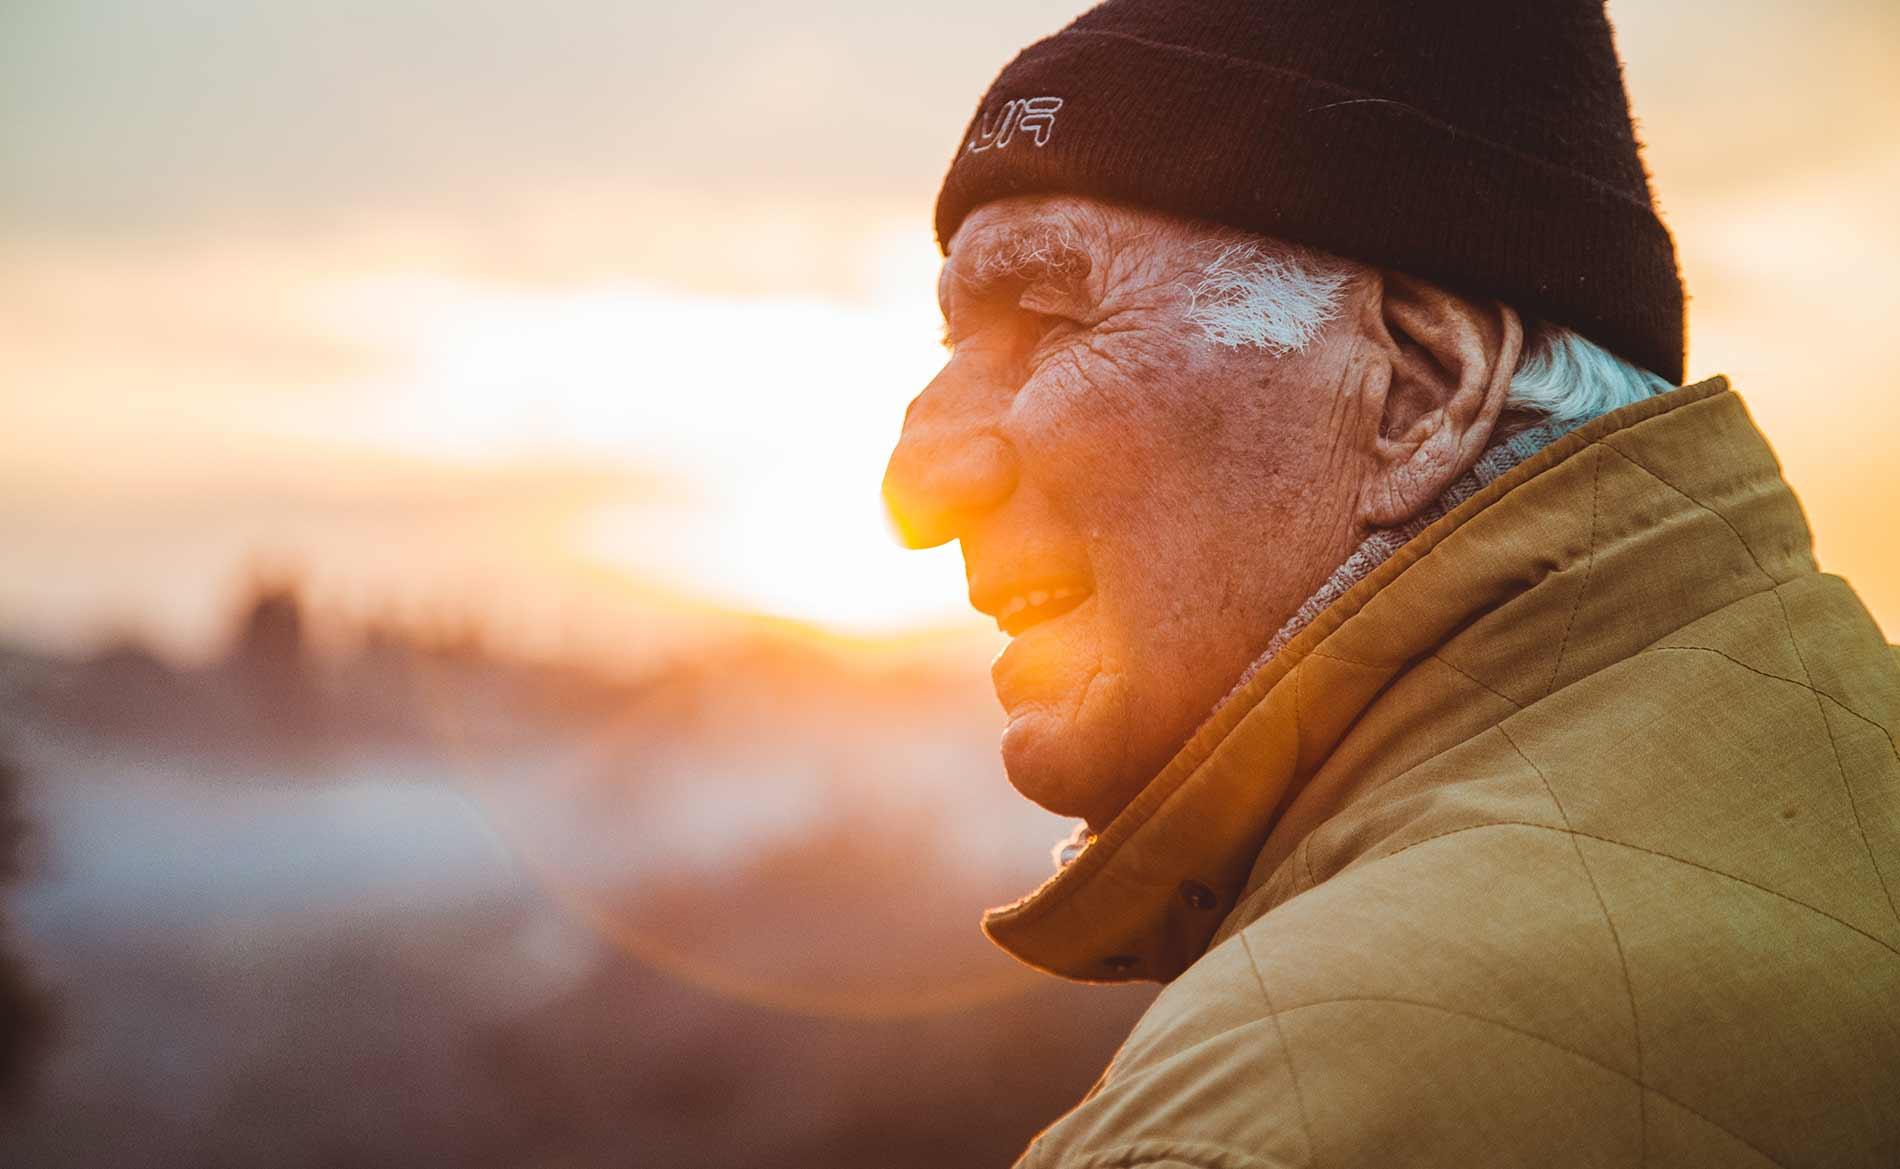 Healthy Elderly Man Enjoying the Outdoors